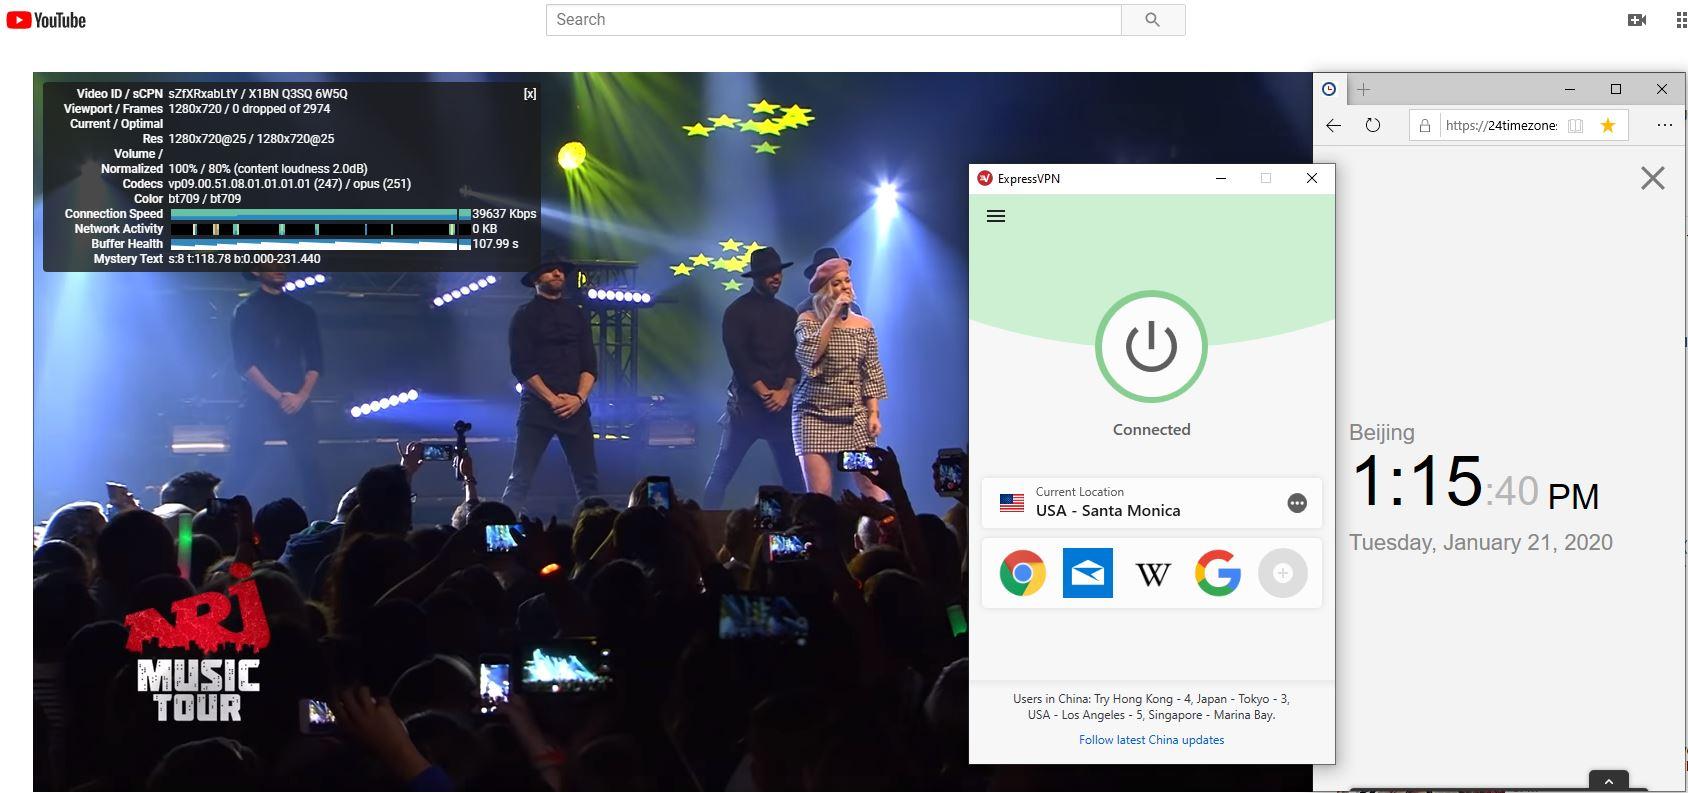 Windows10 ExpressVPN USA - Santa Monica 中国VPN翻墙 科学上网 Youtube测速-20200121